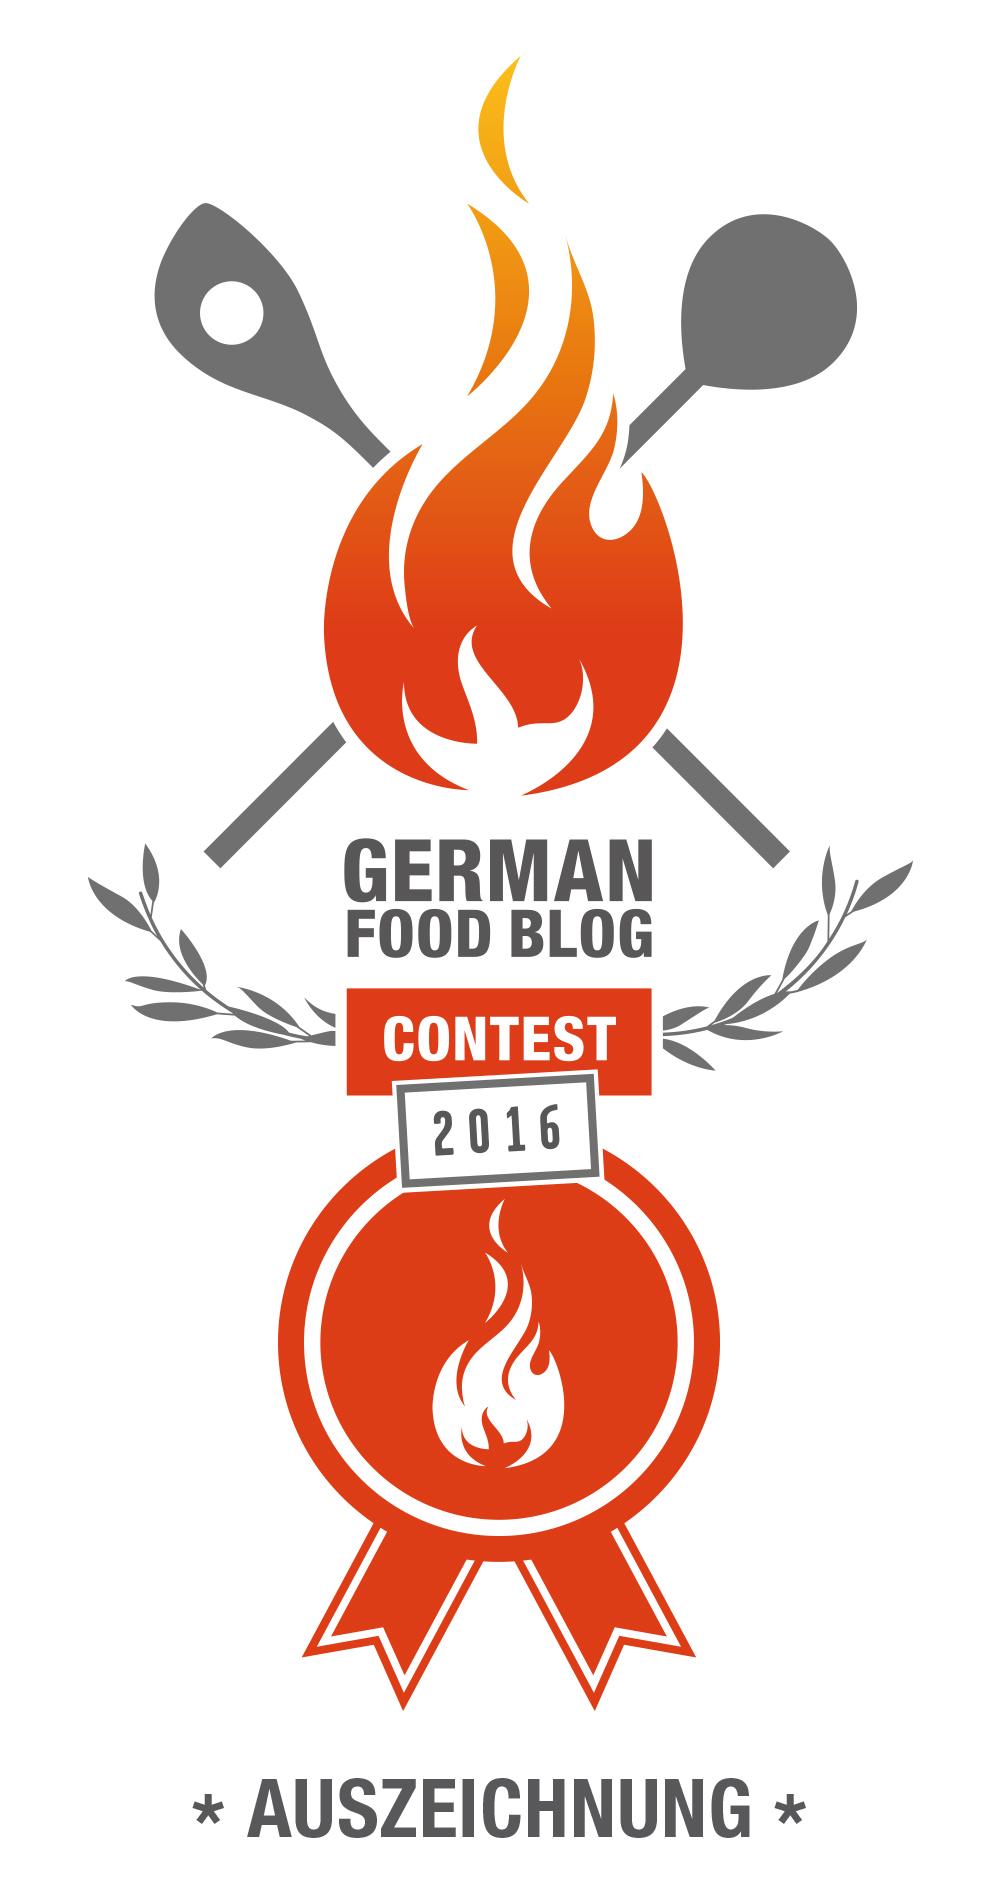 German Food Blog Contest